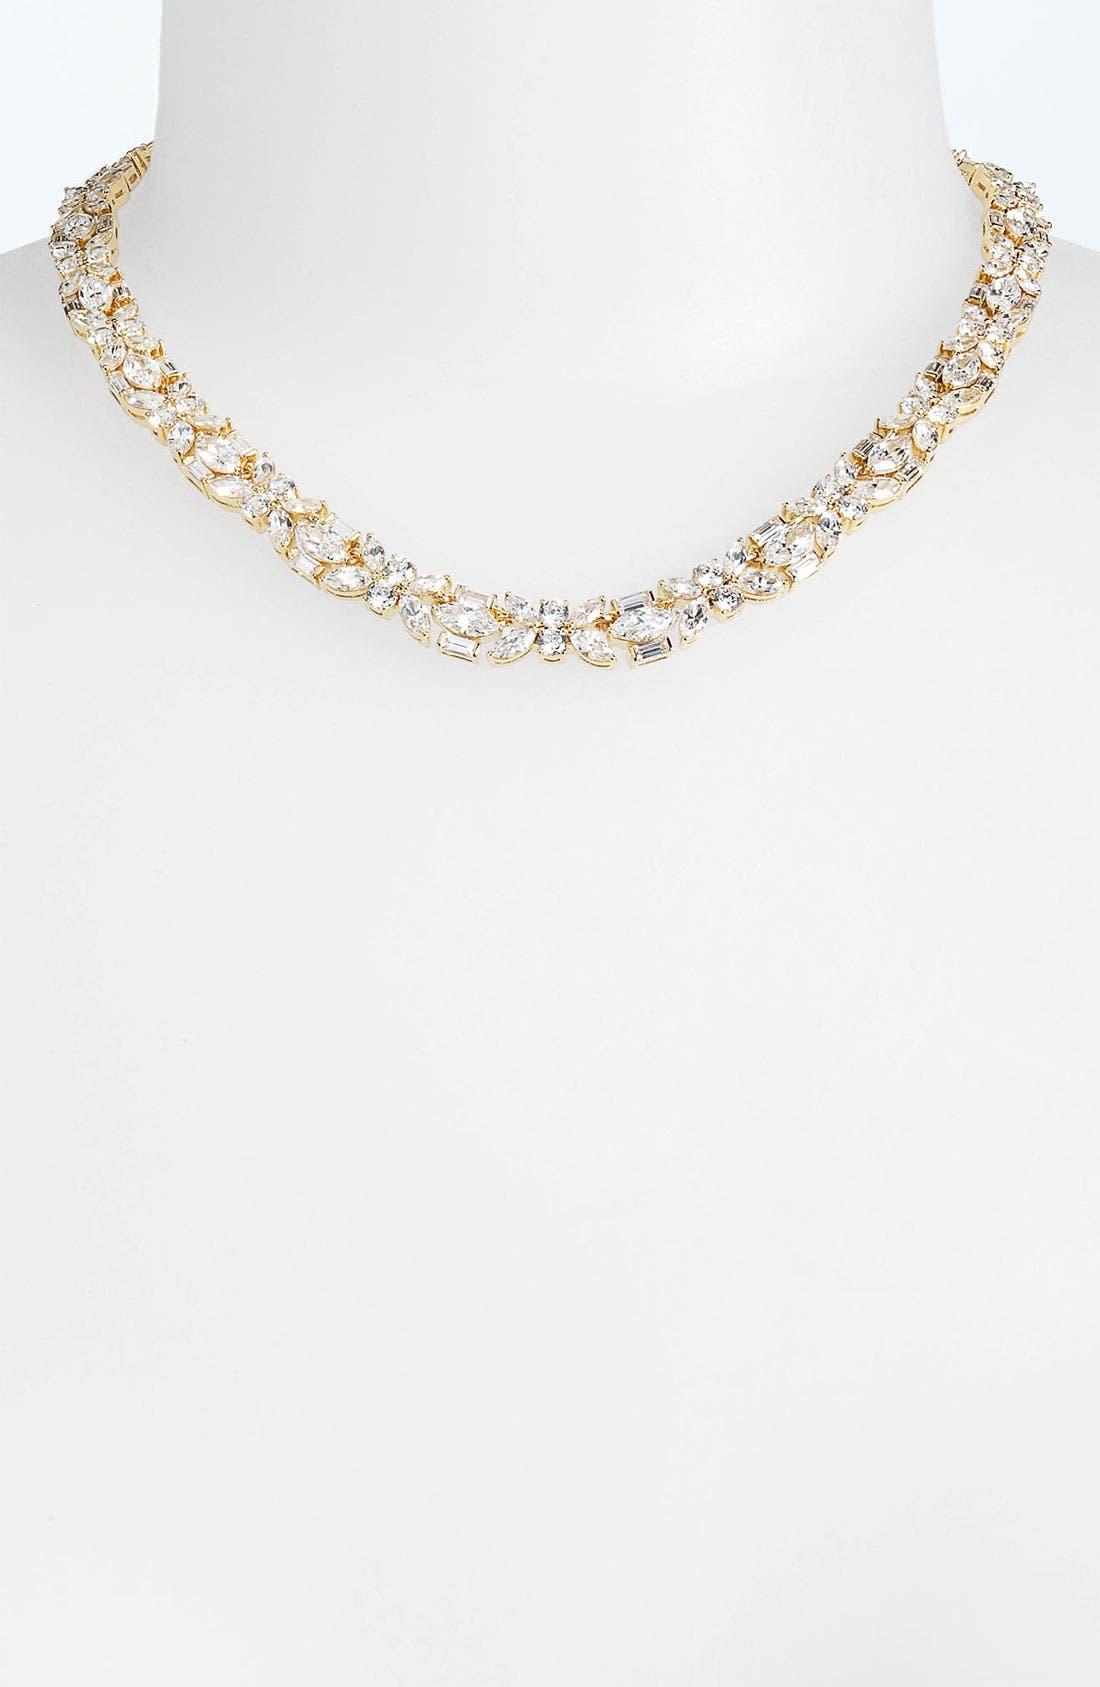 Main Image - Nadri Cubic Zirconia Cluster Collar Necklace (Nordstrom Exclusive)